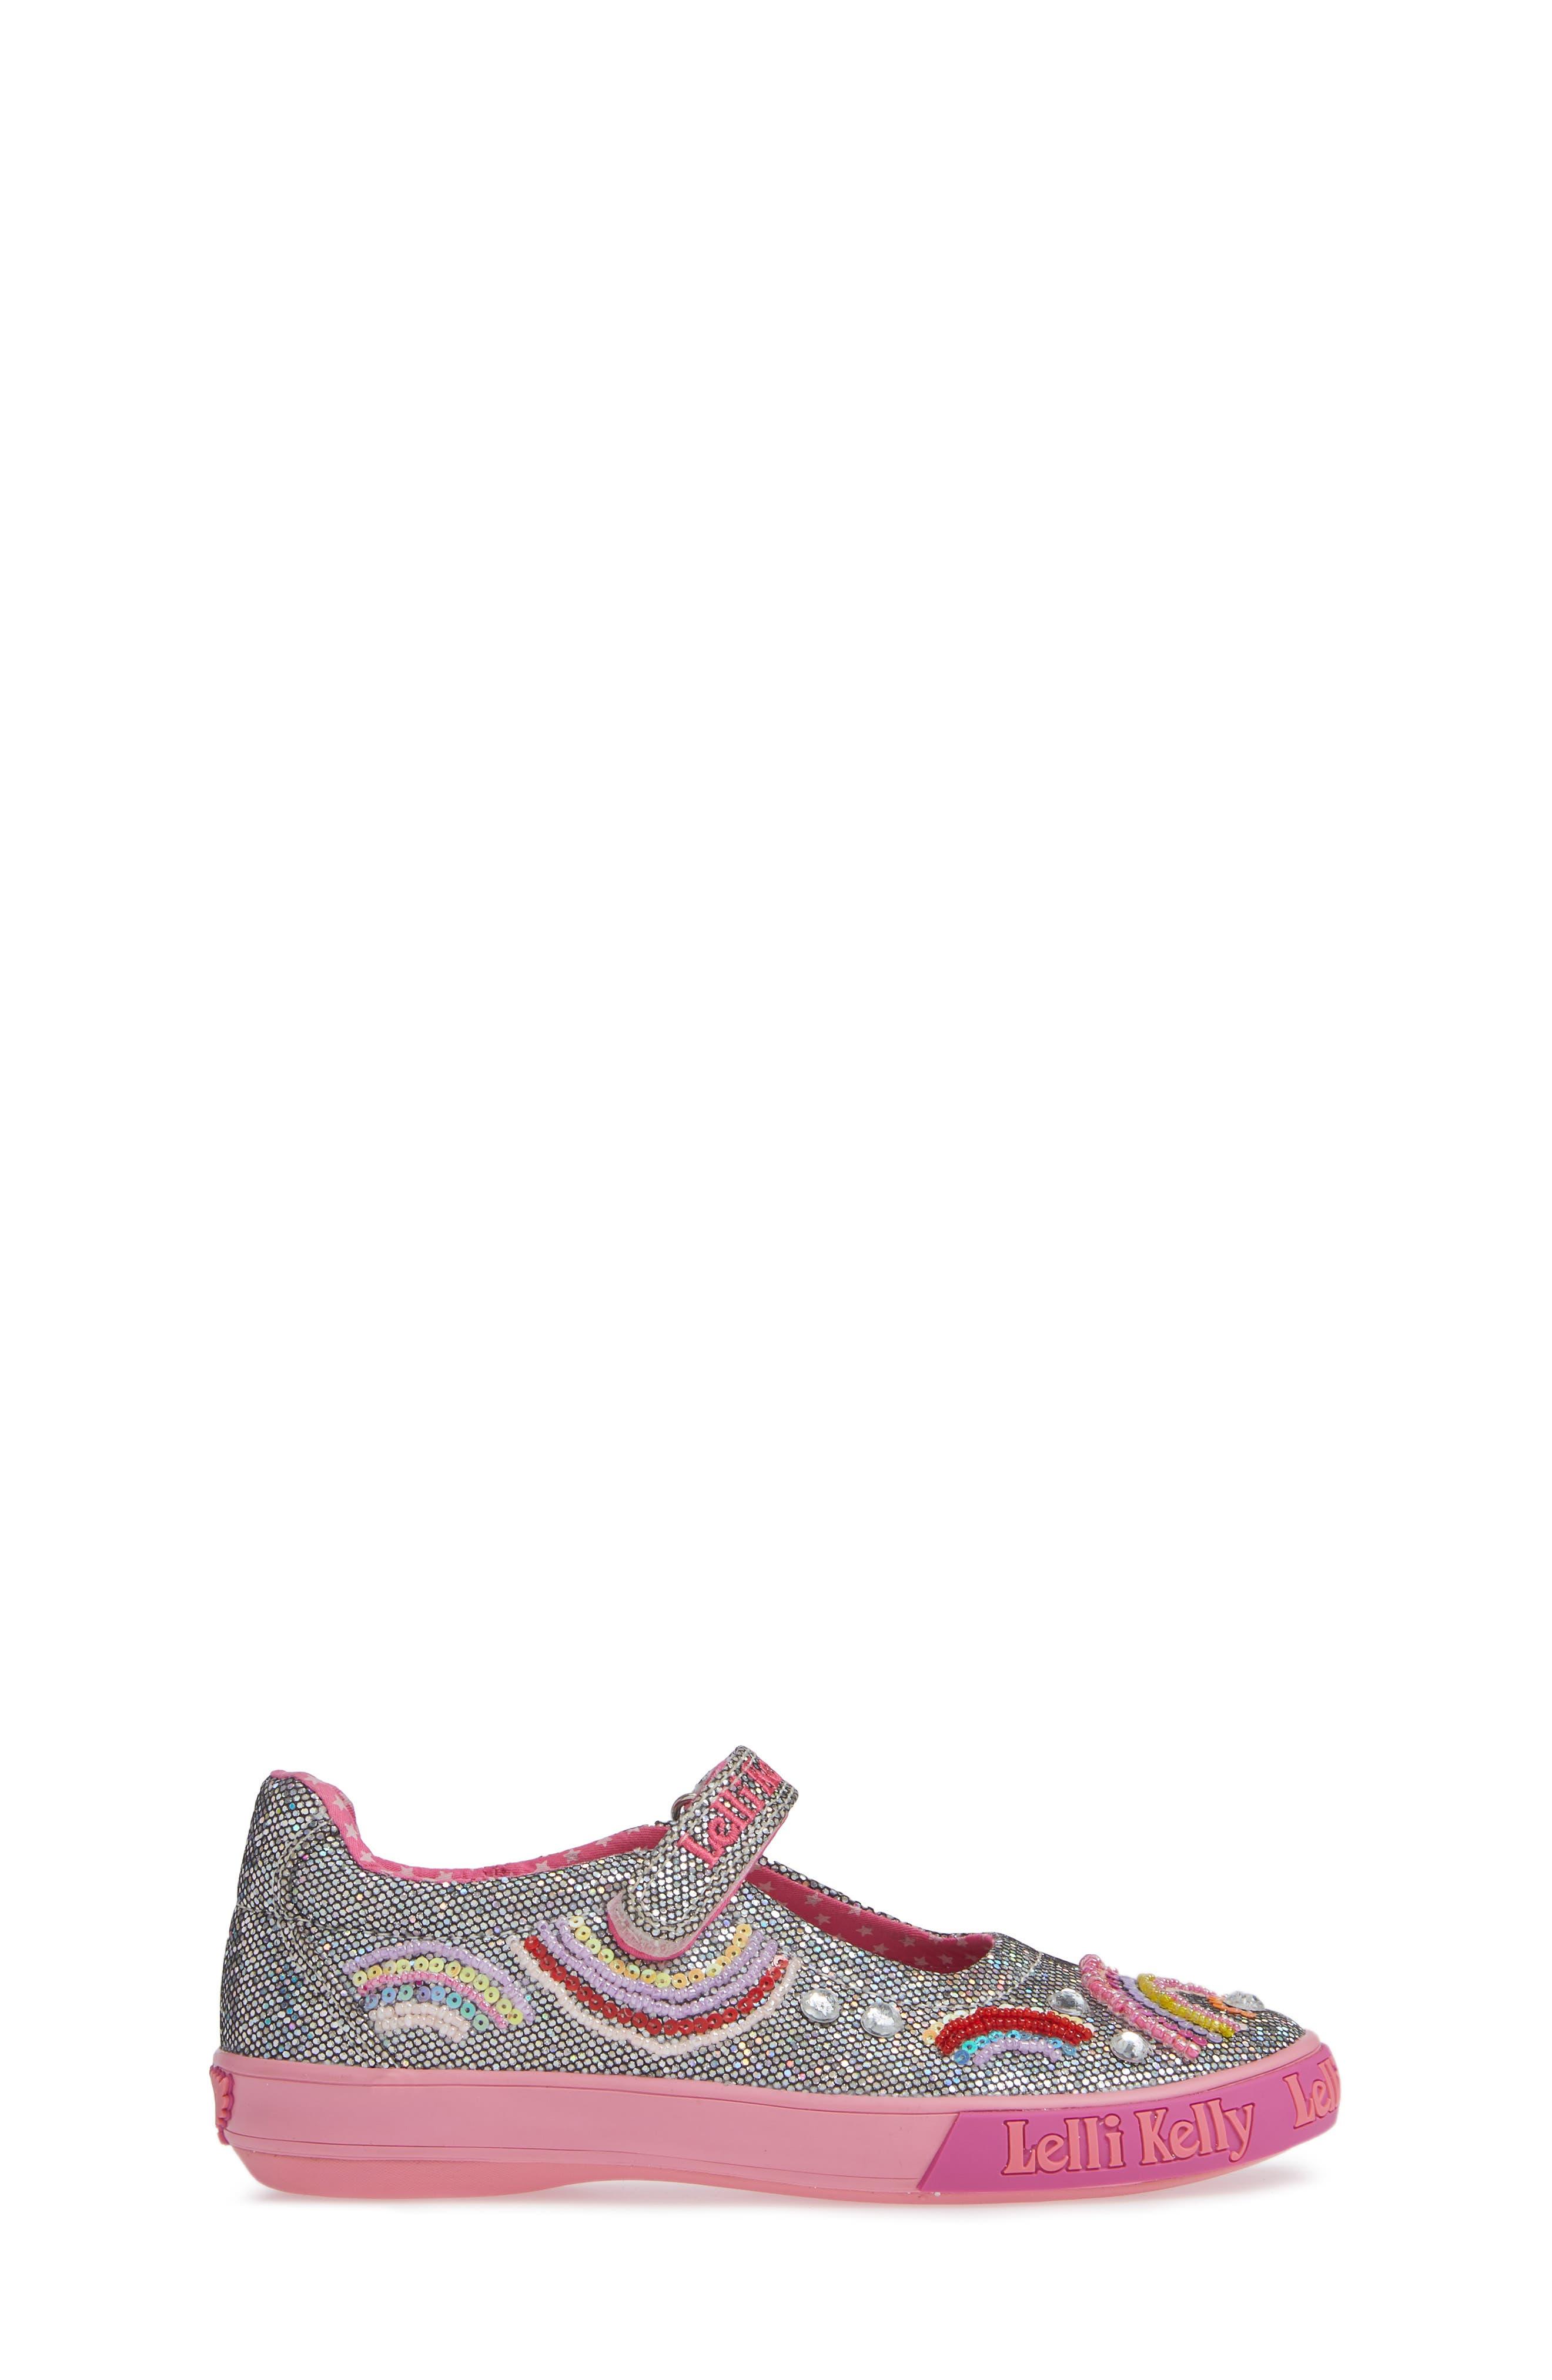 LELLI KELLY, Beaded Rainbow Mary Jane Sneaker, Alternate thumbnail 3, color, PEWTER